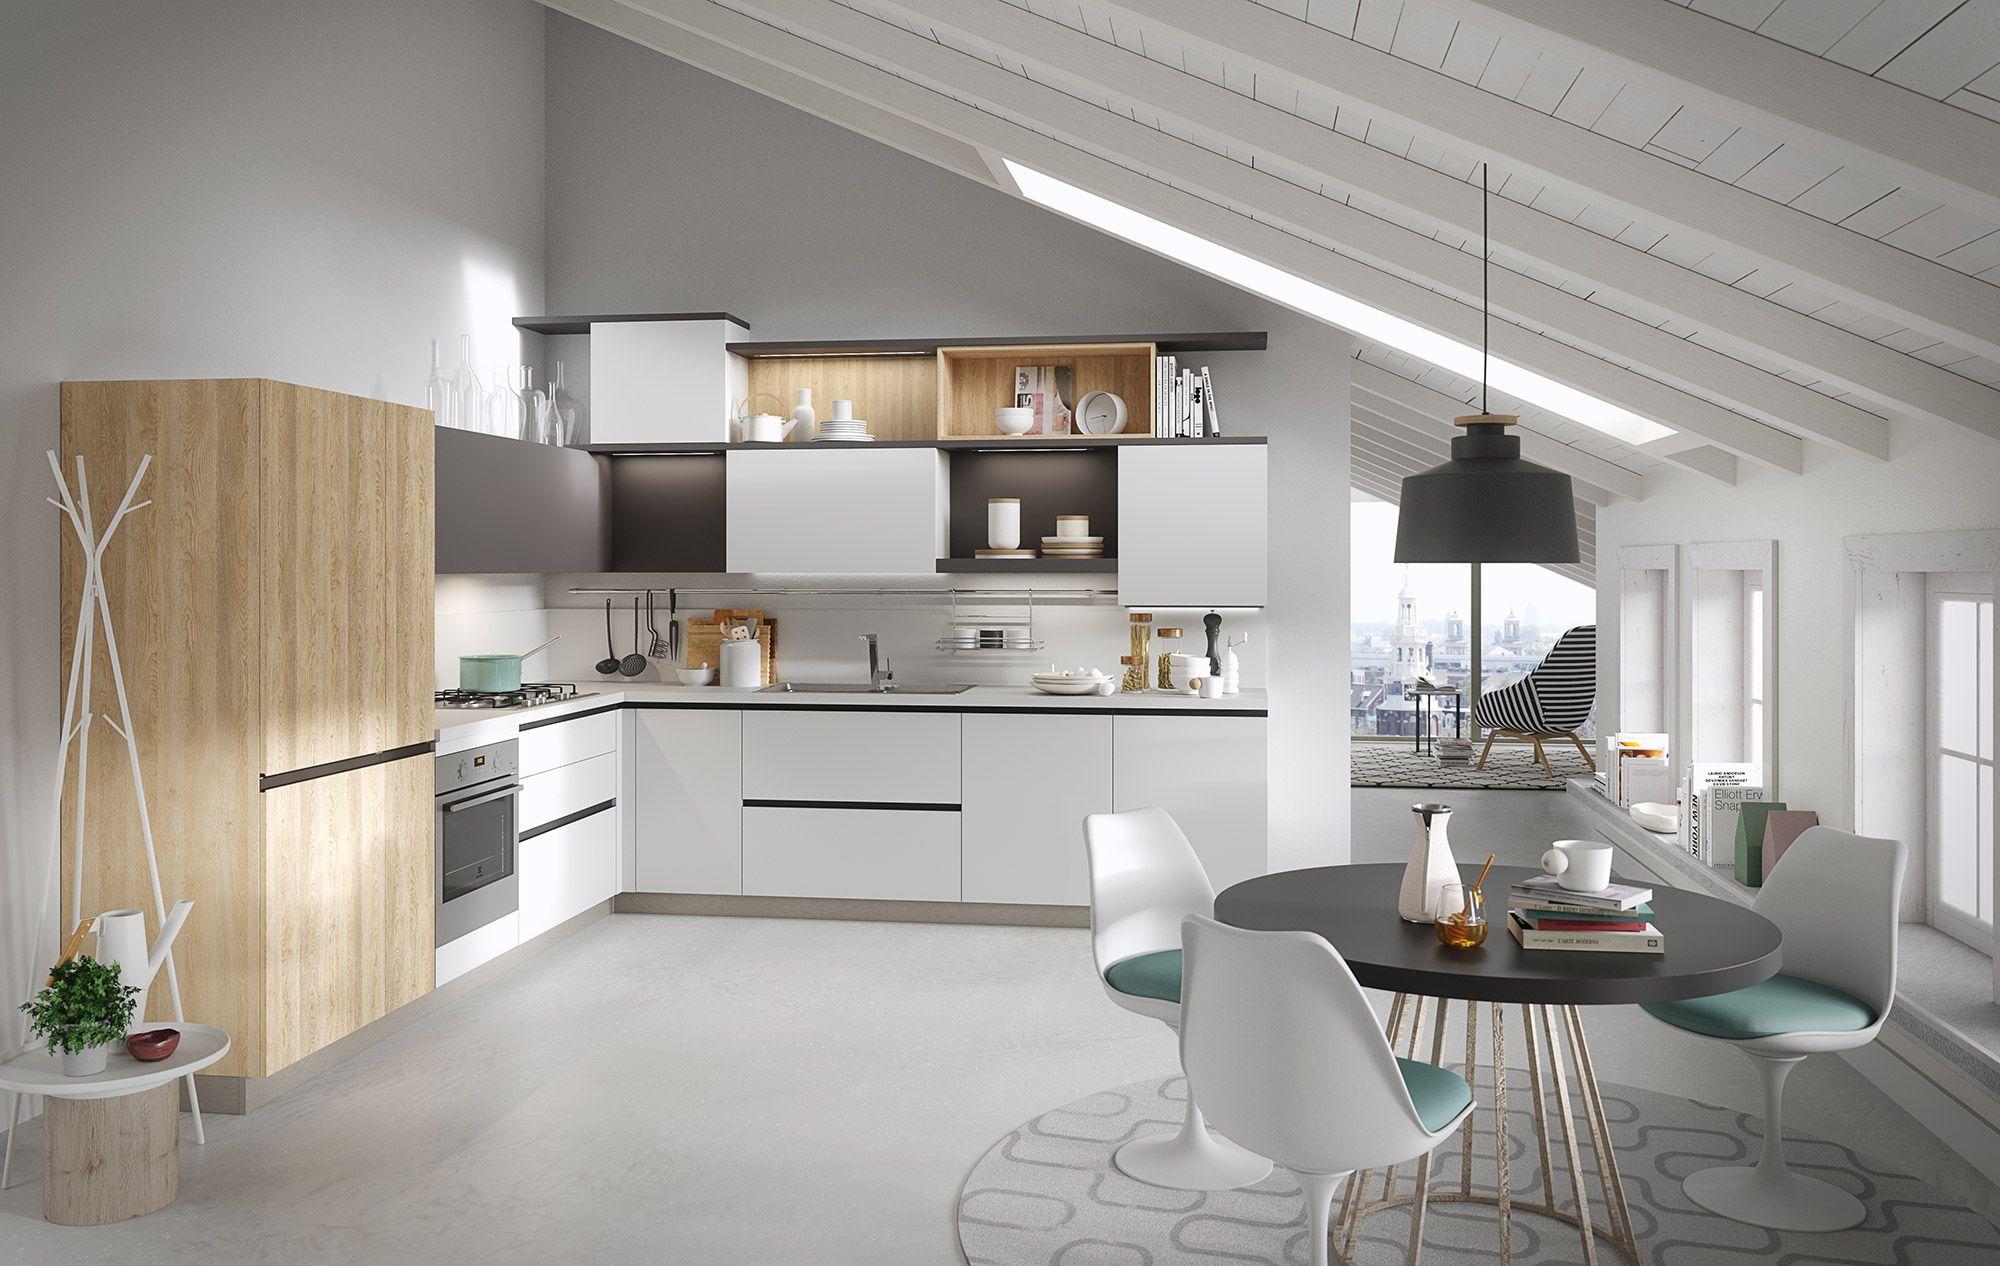 Pensile Angolare Cucina Ikea ante armadietti cucina snaidero